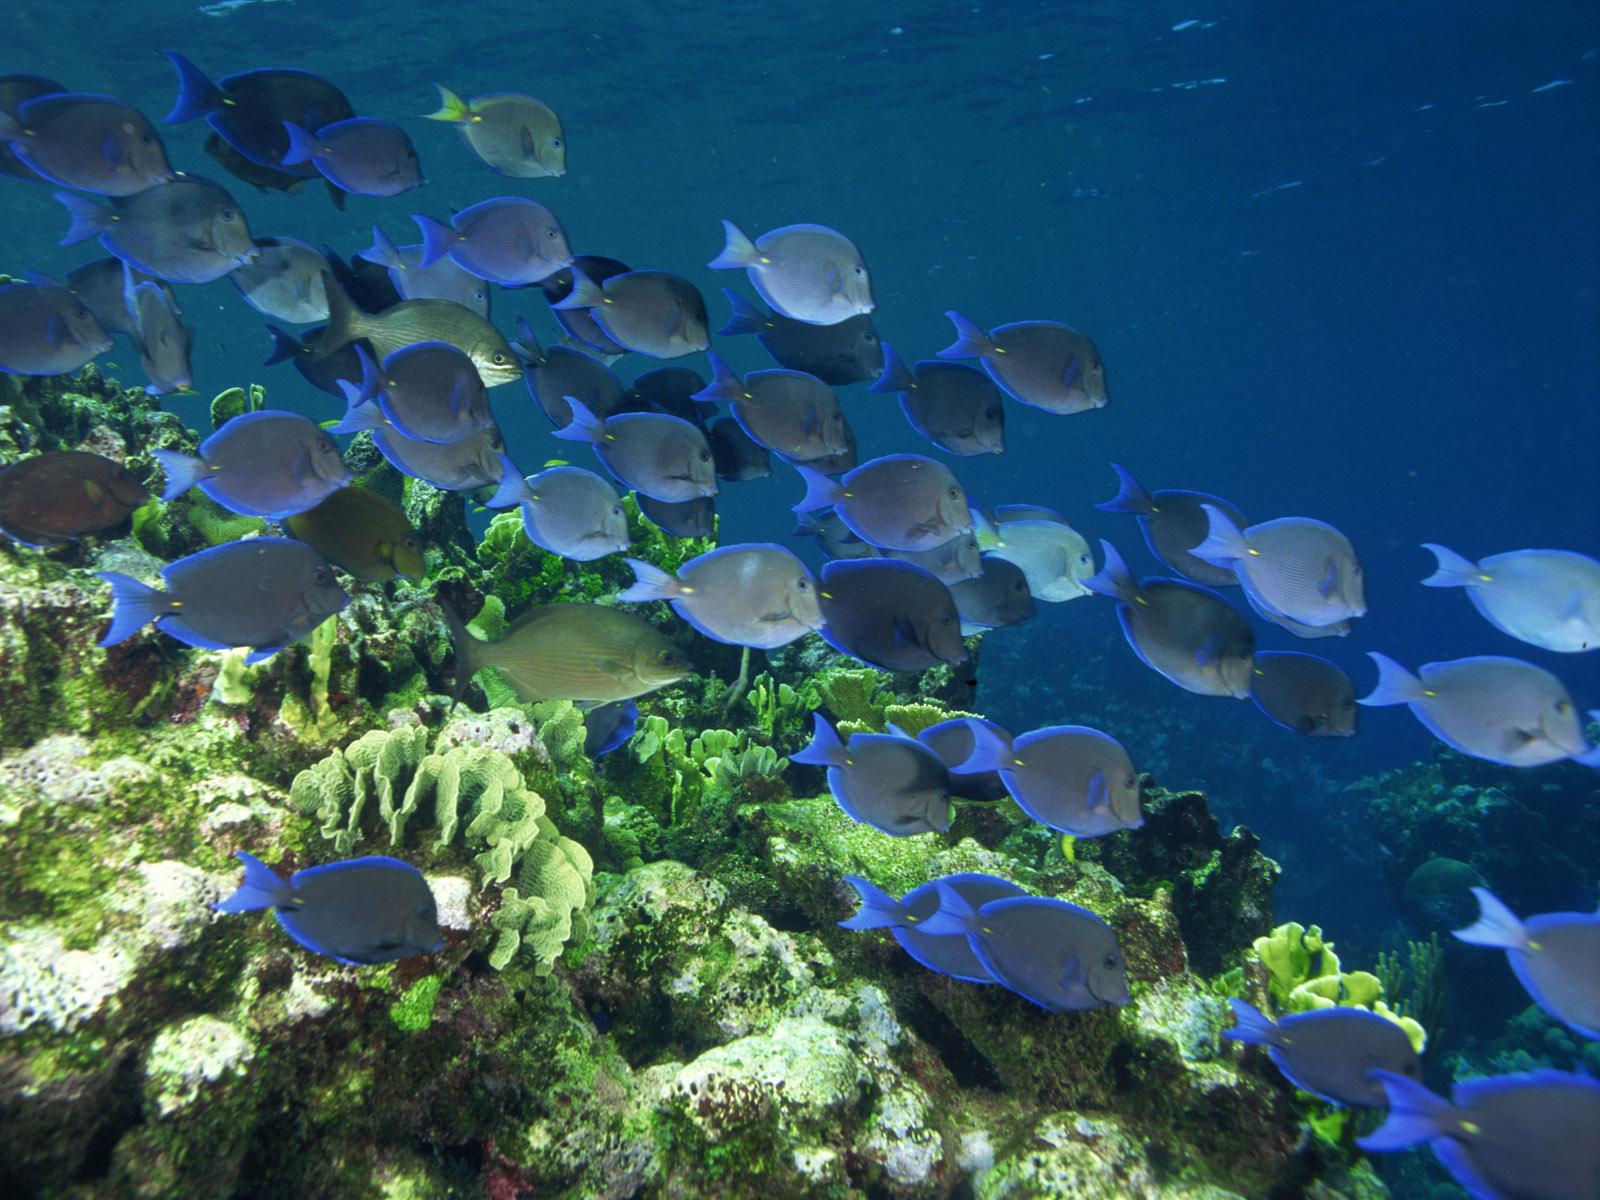 Colorful Coral Reef Fish wallpaper wallpaper hd background desktop 1600x1200